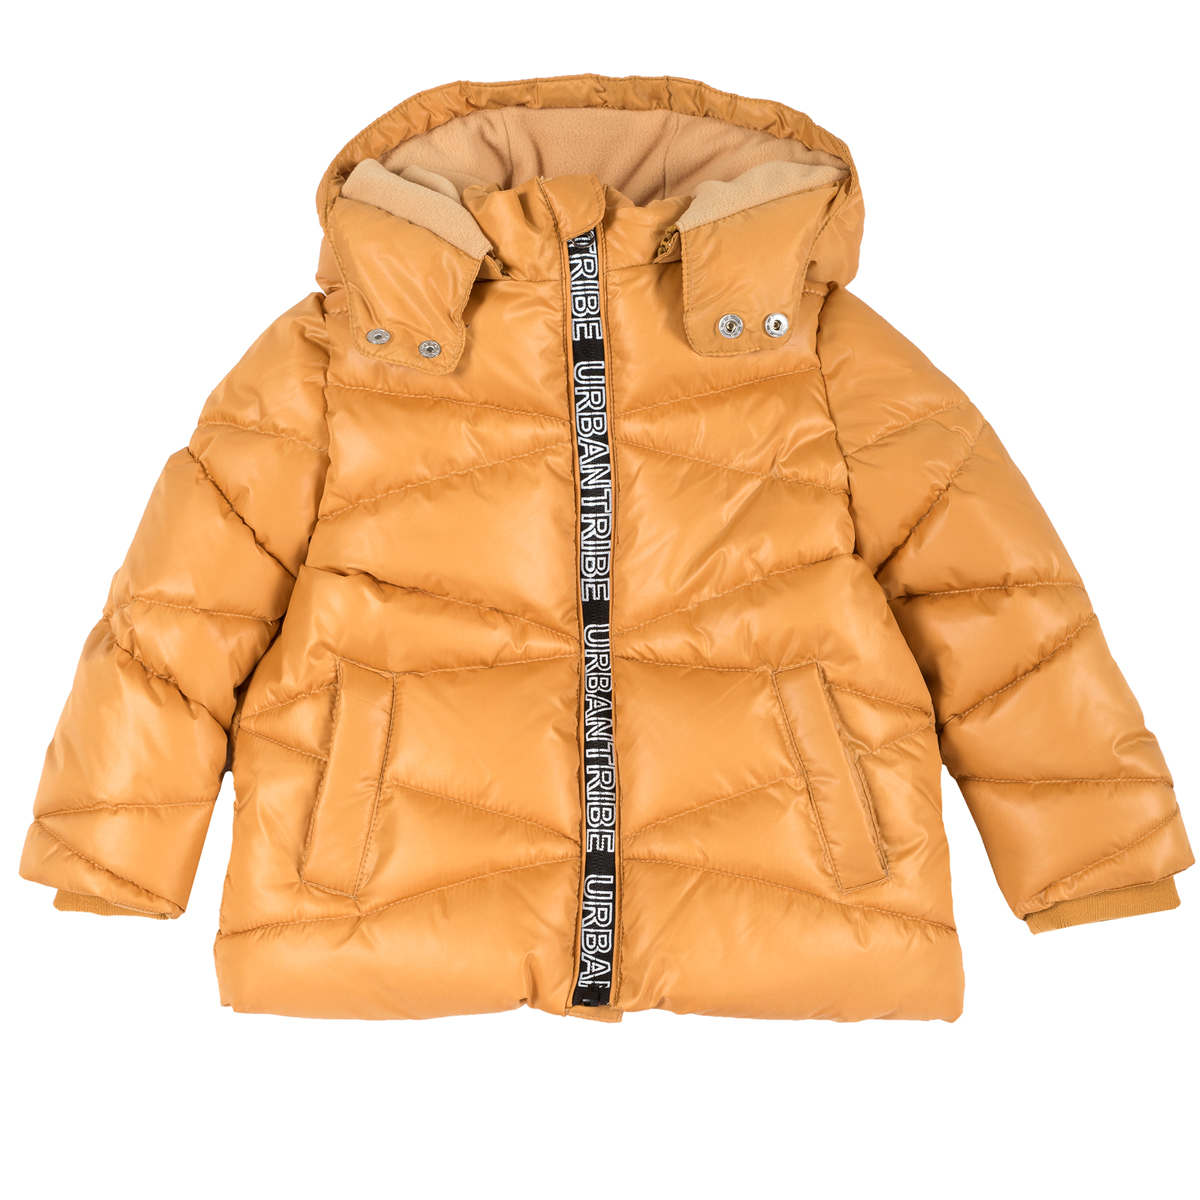 Jacheta copii Chicco, matlasata cu gluga detasabila, auriu, 87442